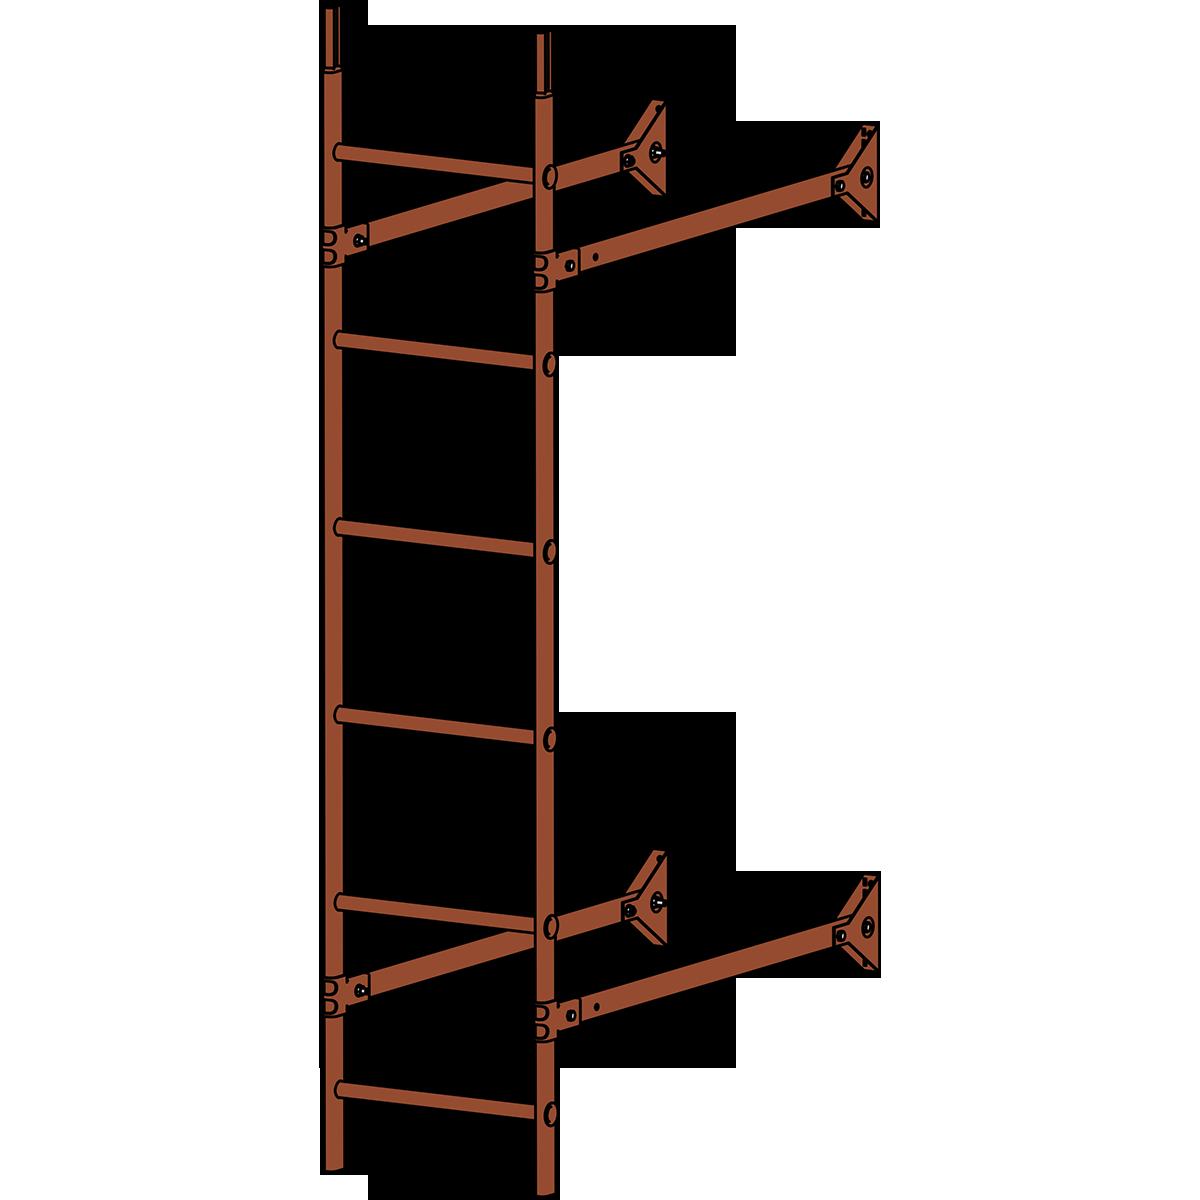 Лестница стеновая ROOFSYSTEMS ELITE 400 1,8 м RAL 8004 Коричневая медь